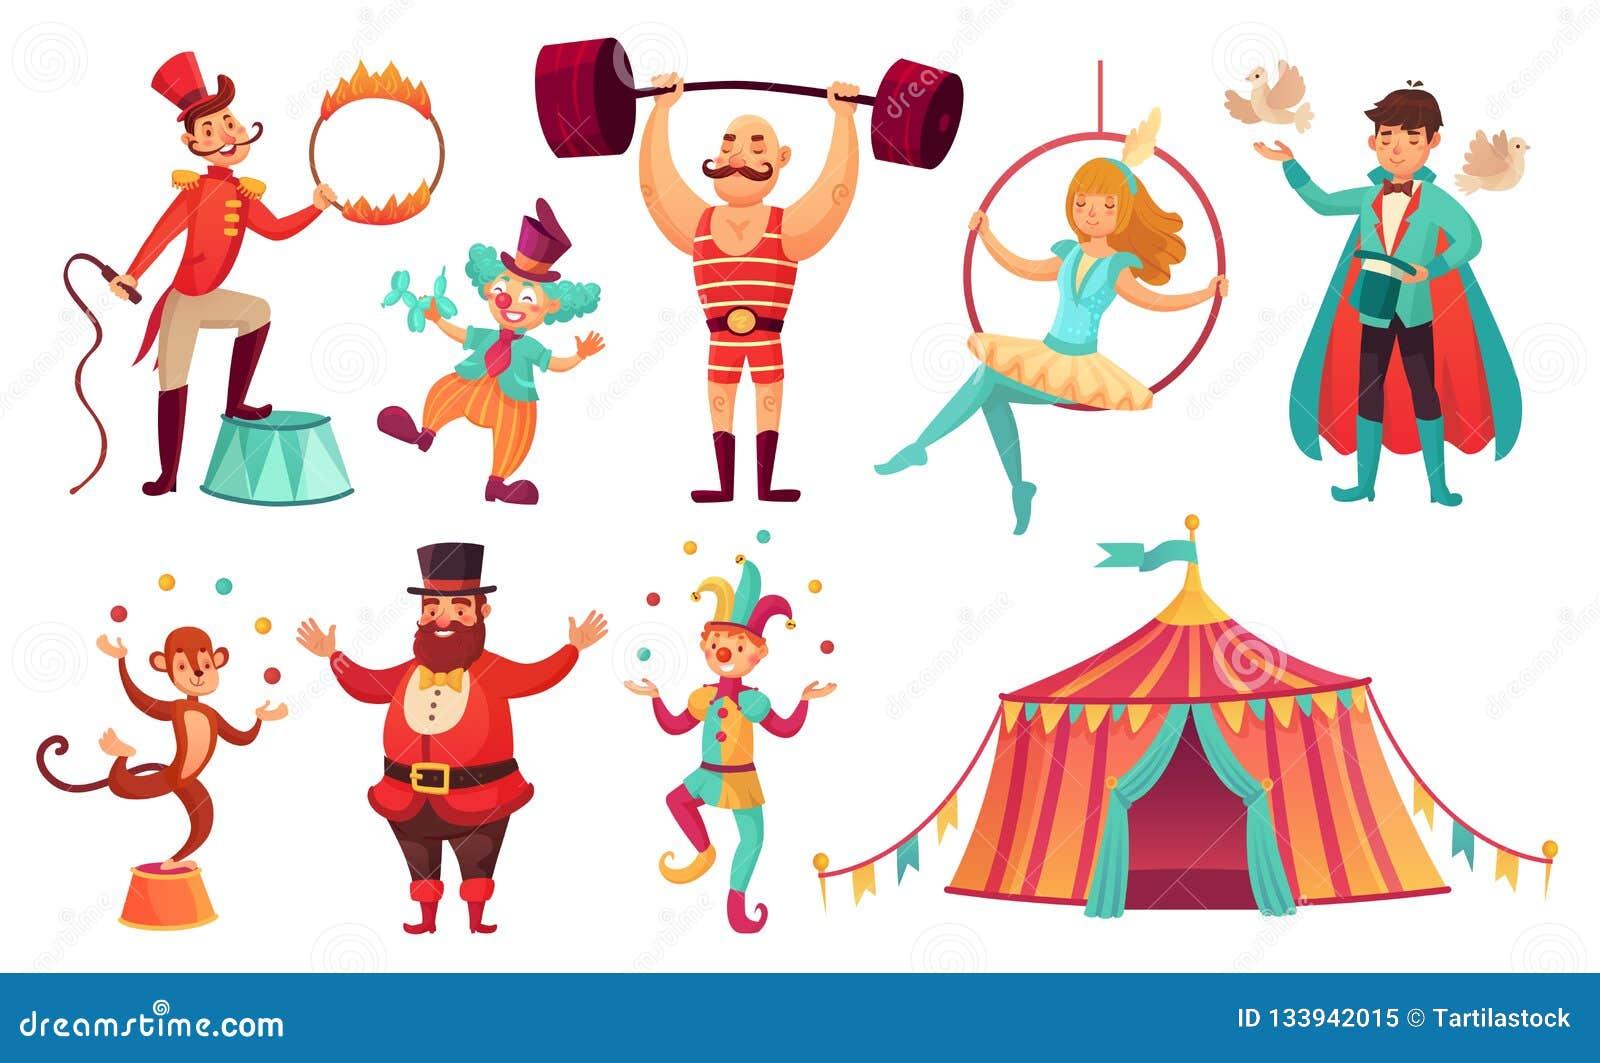 Circus Characters  Juggling Animals, Juggler Artist Clown